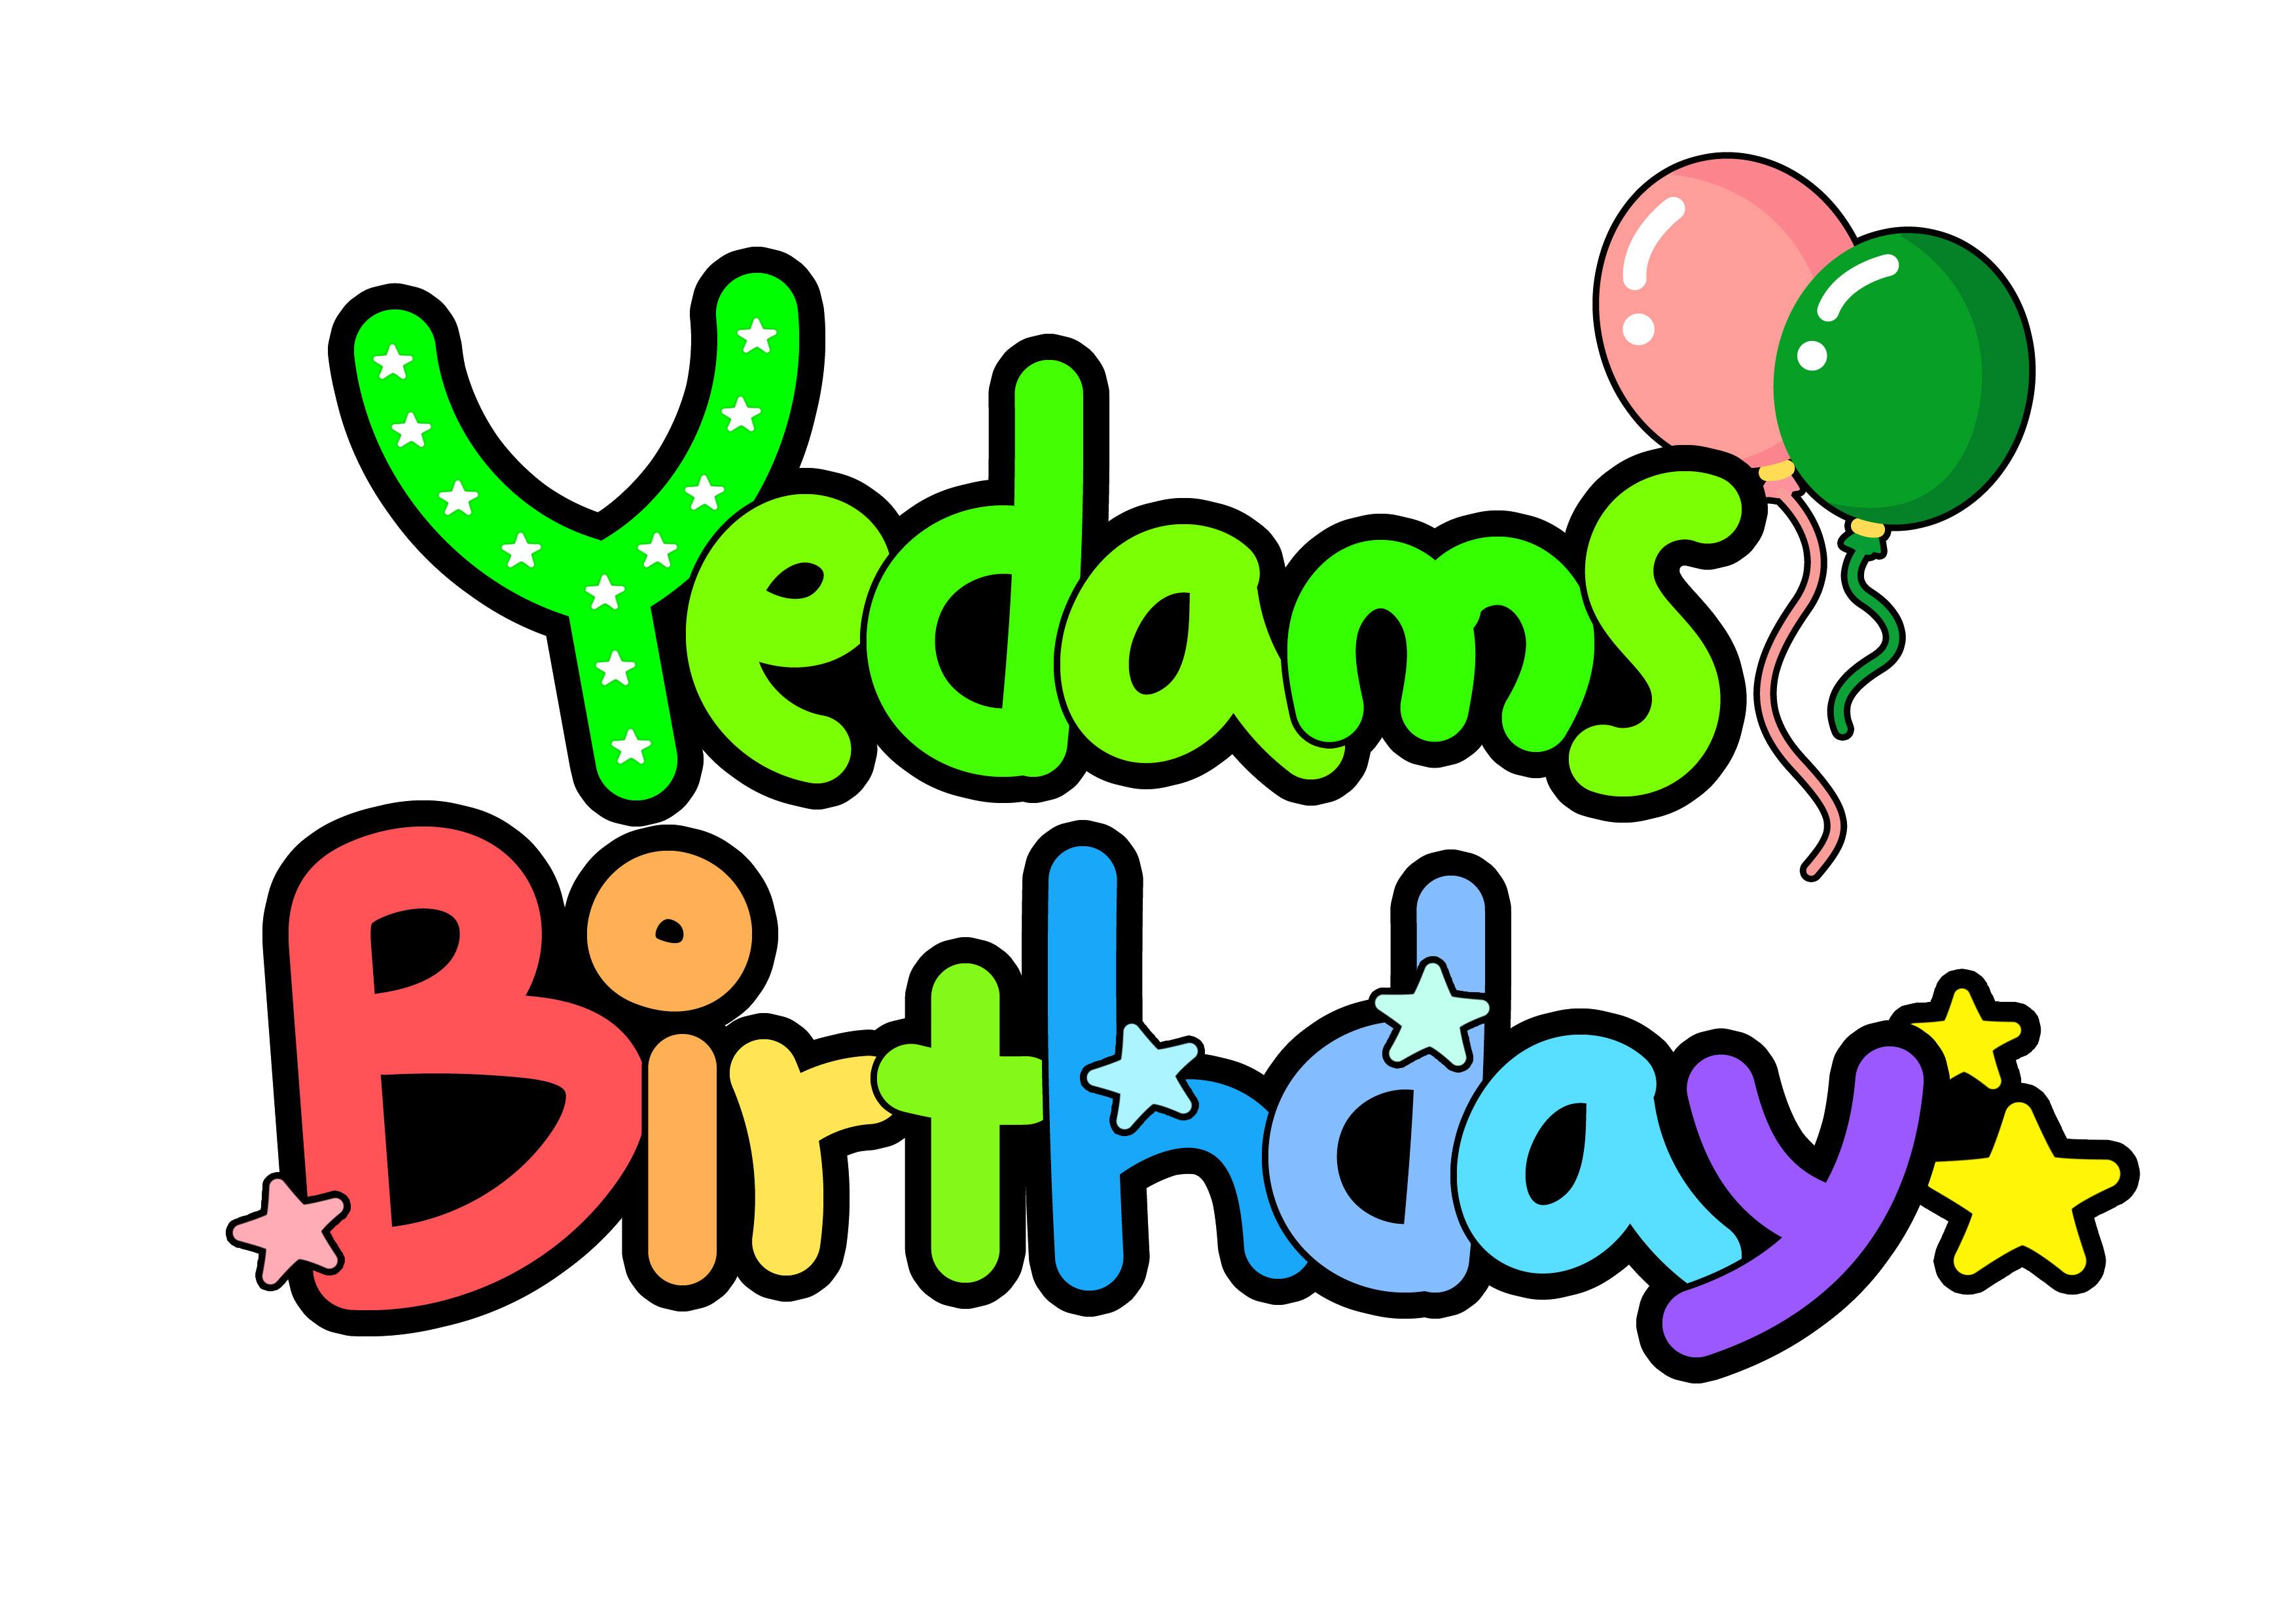 Yedams Birthday (생일, 생일파티, 가렌드, 어린이집, 유치원, 생일축하)